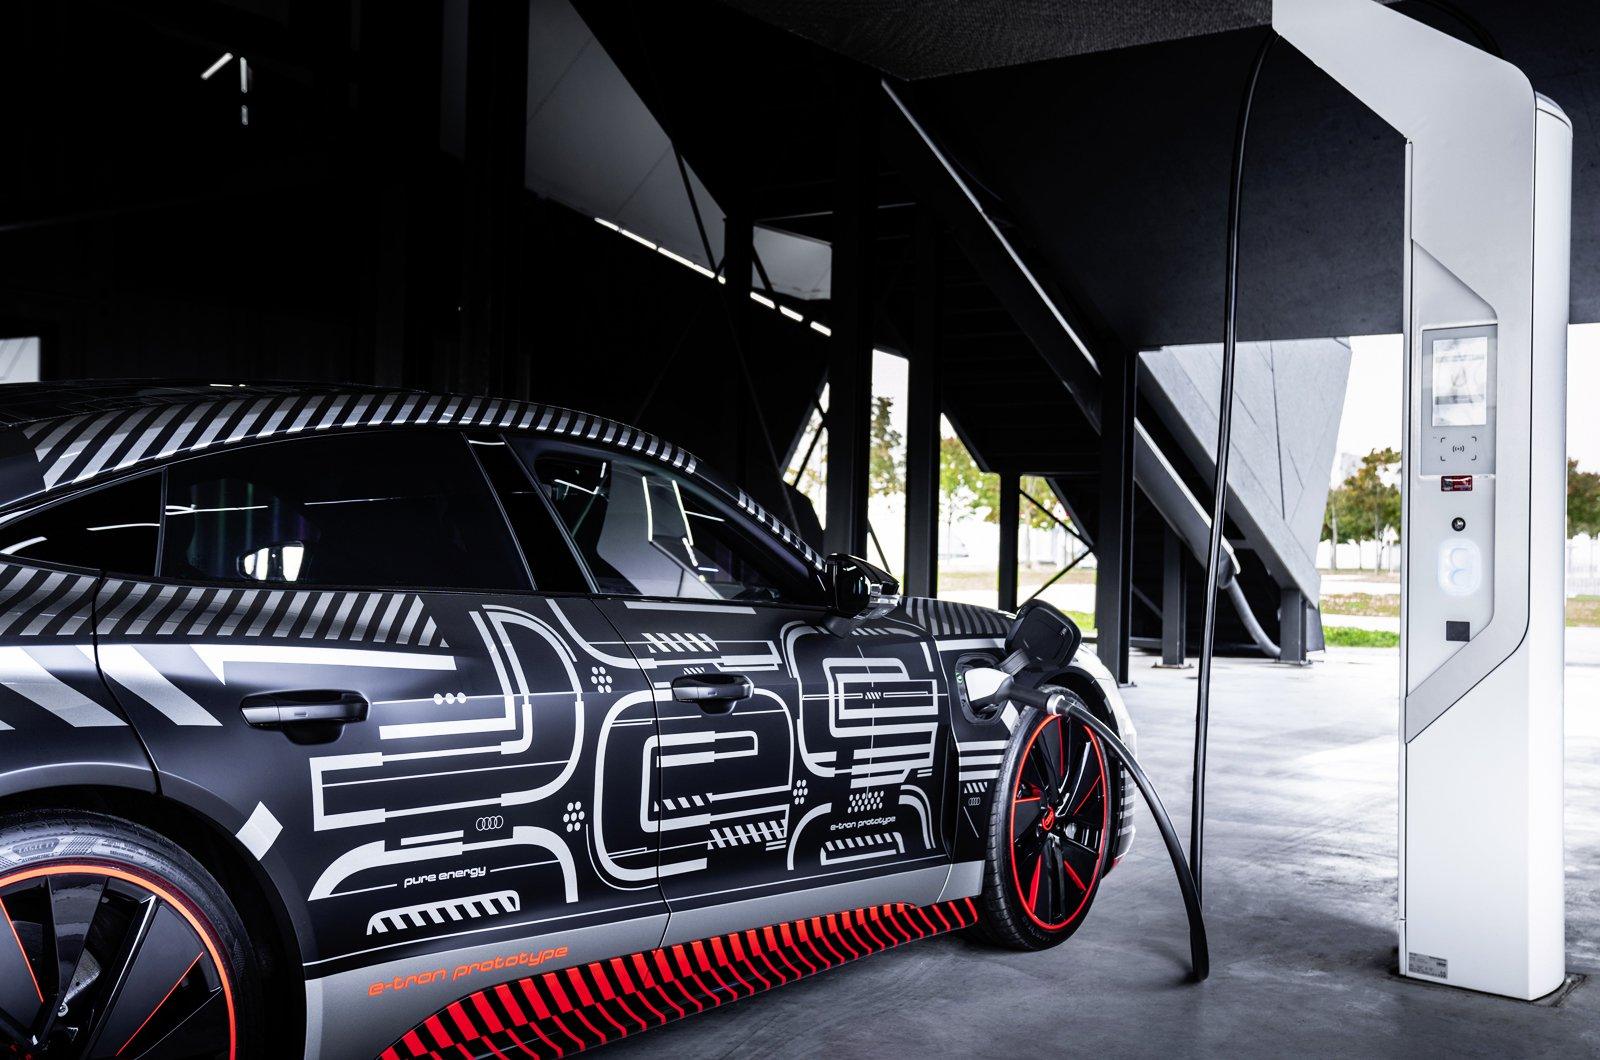 Audi E-tron GT prototype charging